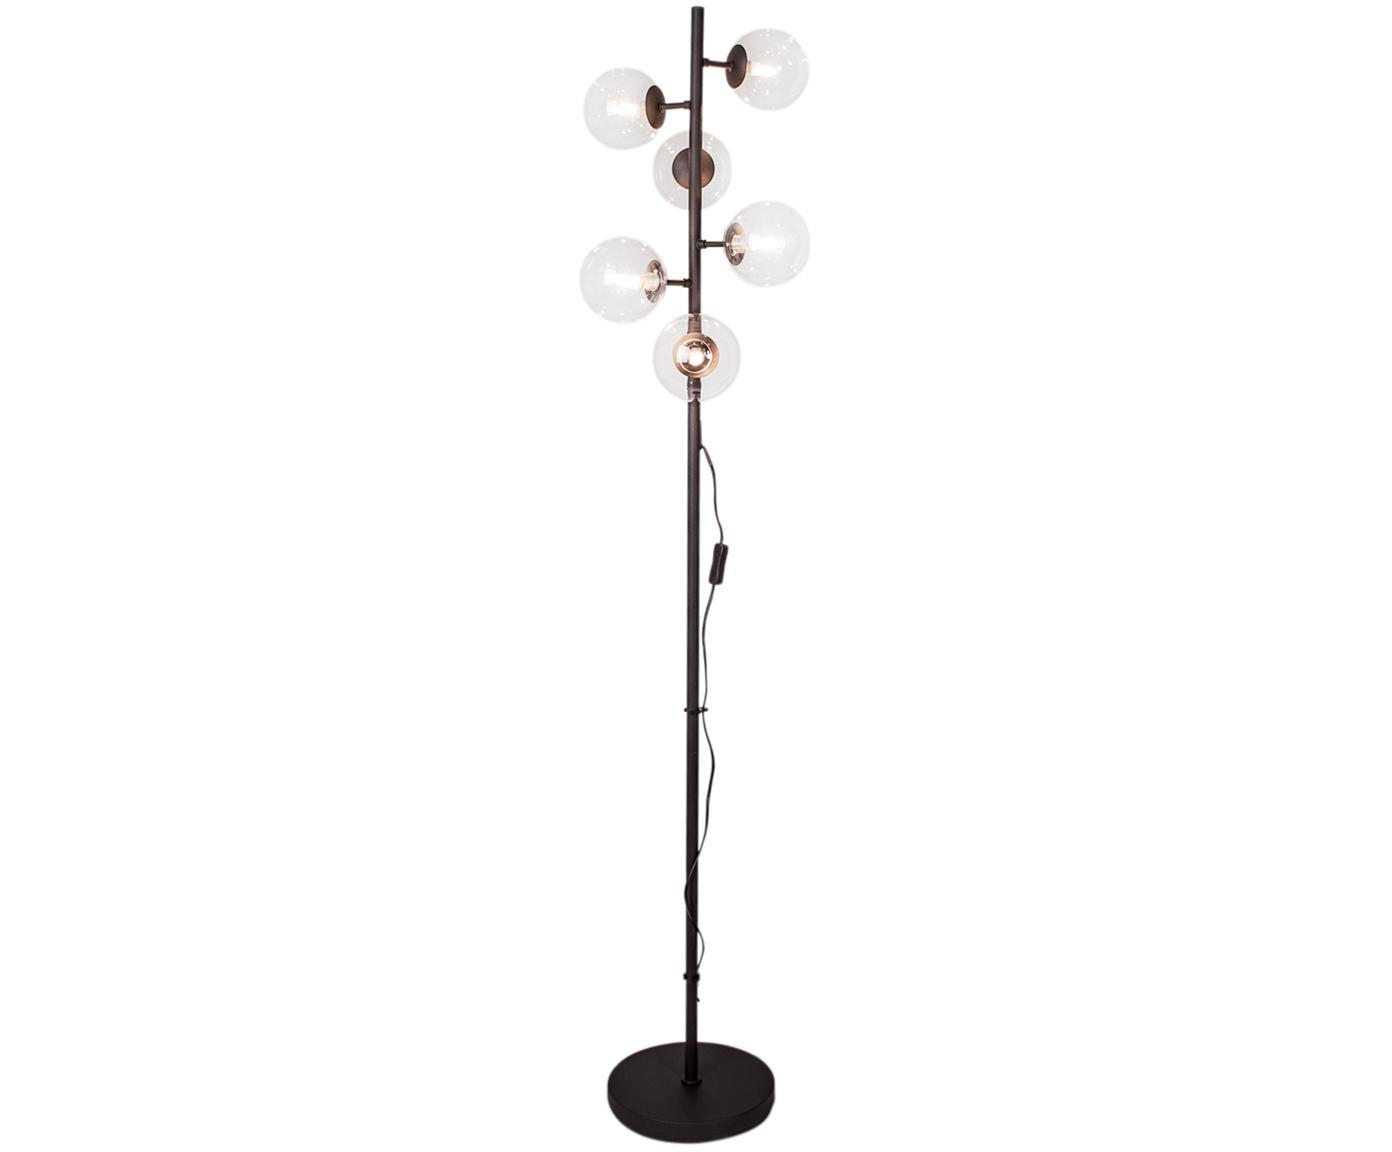 Lámpara de pie Move, Pantalla: vidrio, Cable: plástico, Negro, transparente, Ø 35 x Al 160 cm